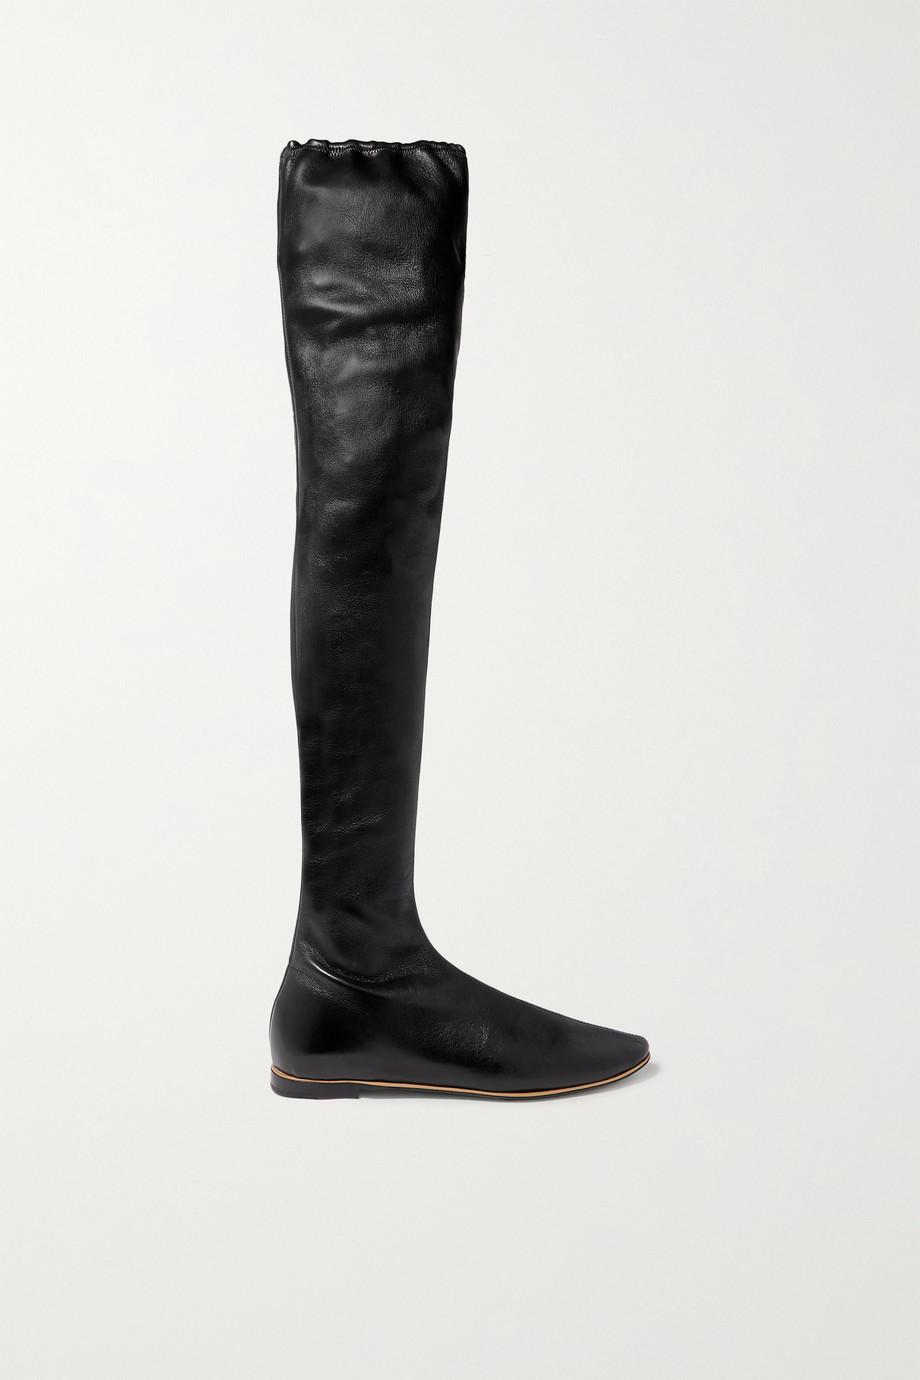 Bottega Veneta Leather over-the-knee boots